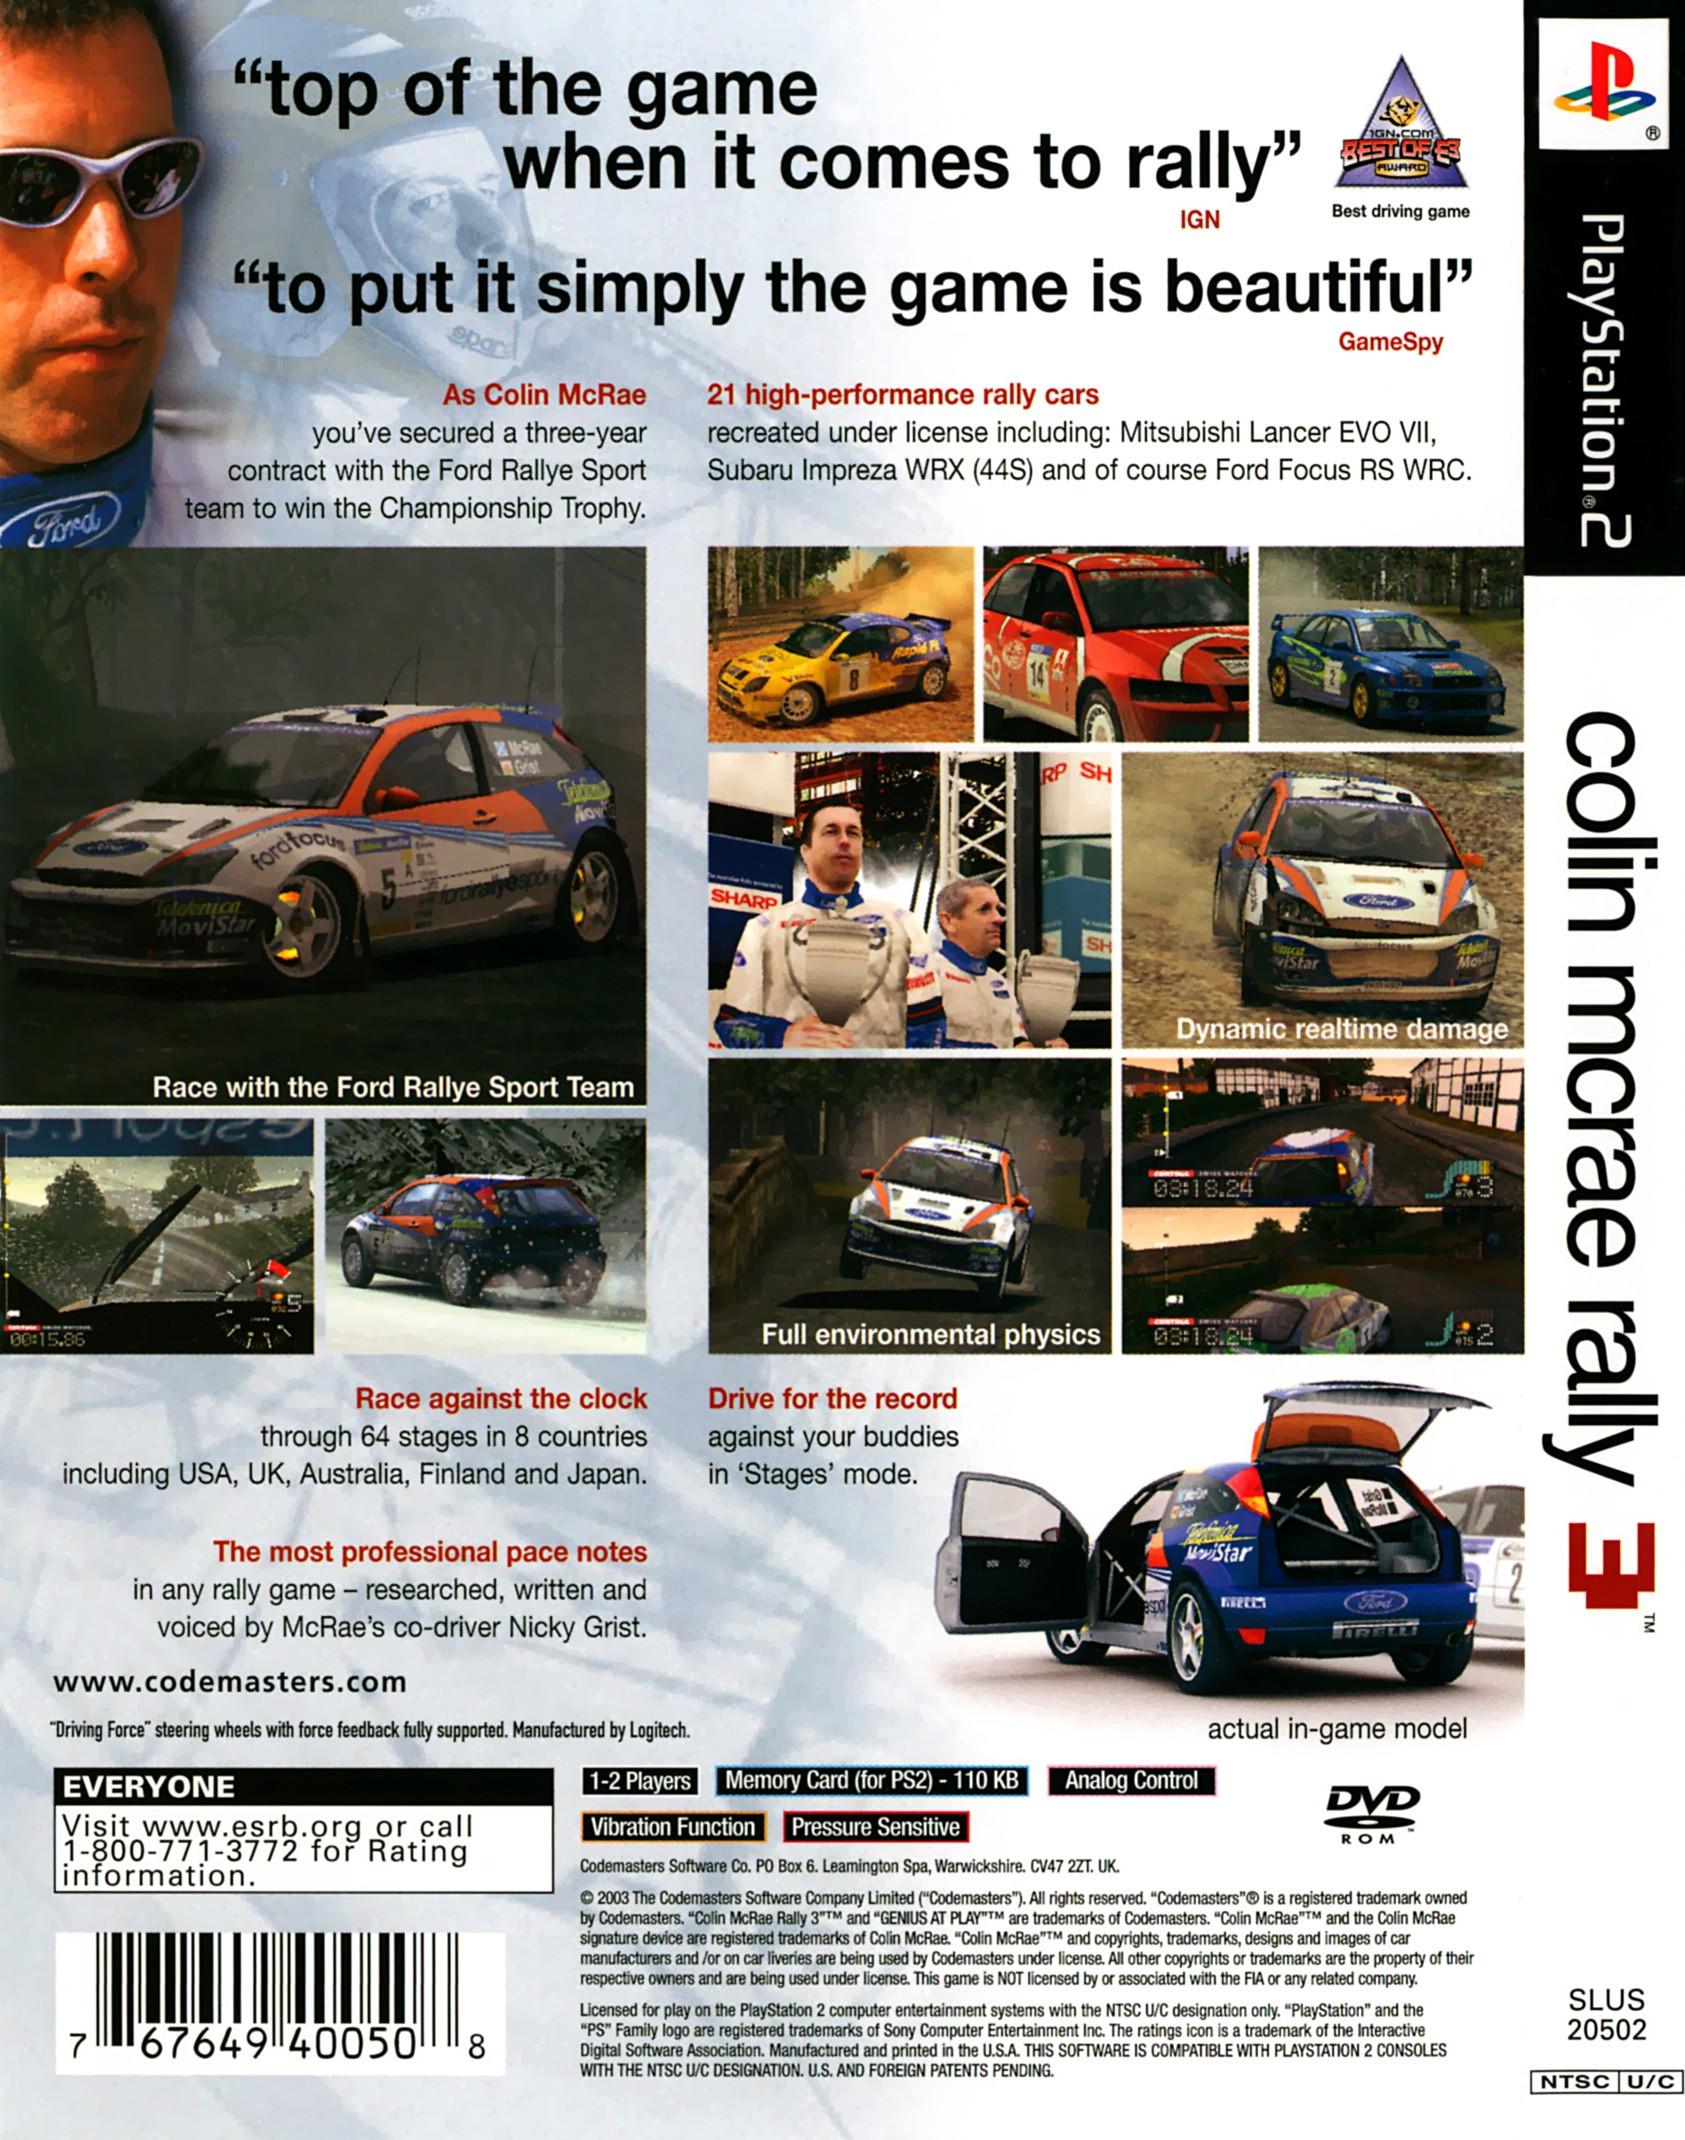 colin mcrae rally 3 details launchbox games database. Black Bedroom Furniture Sets. Home Design Ideas